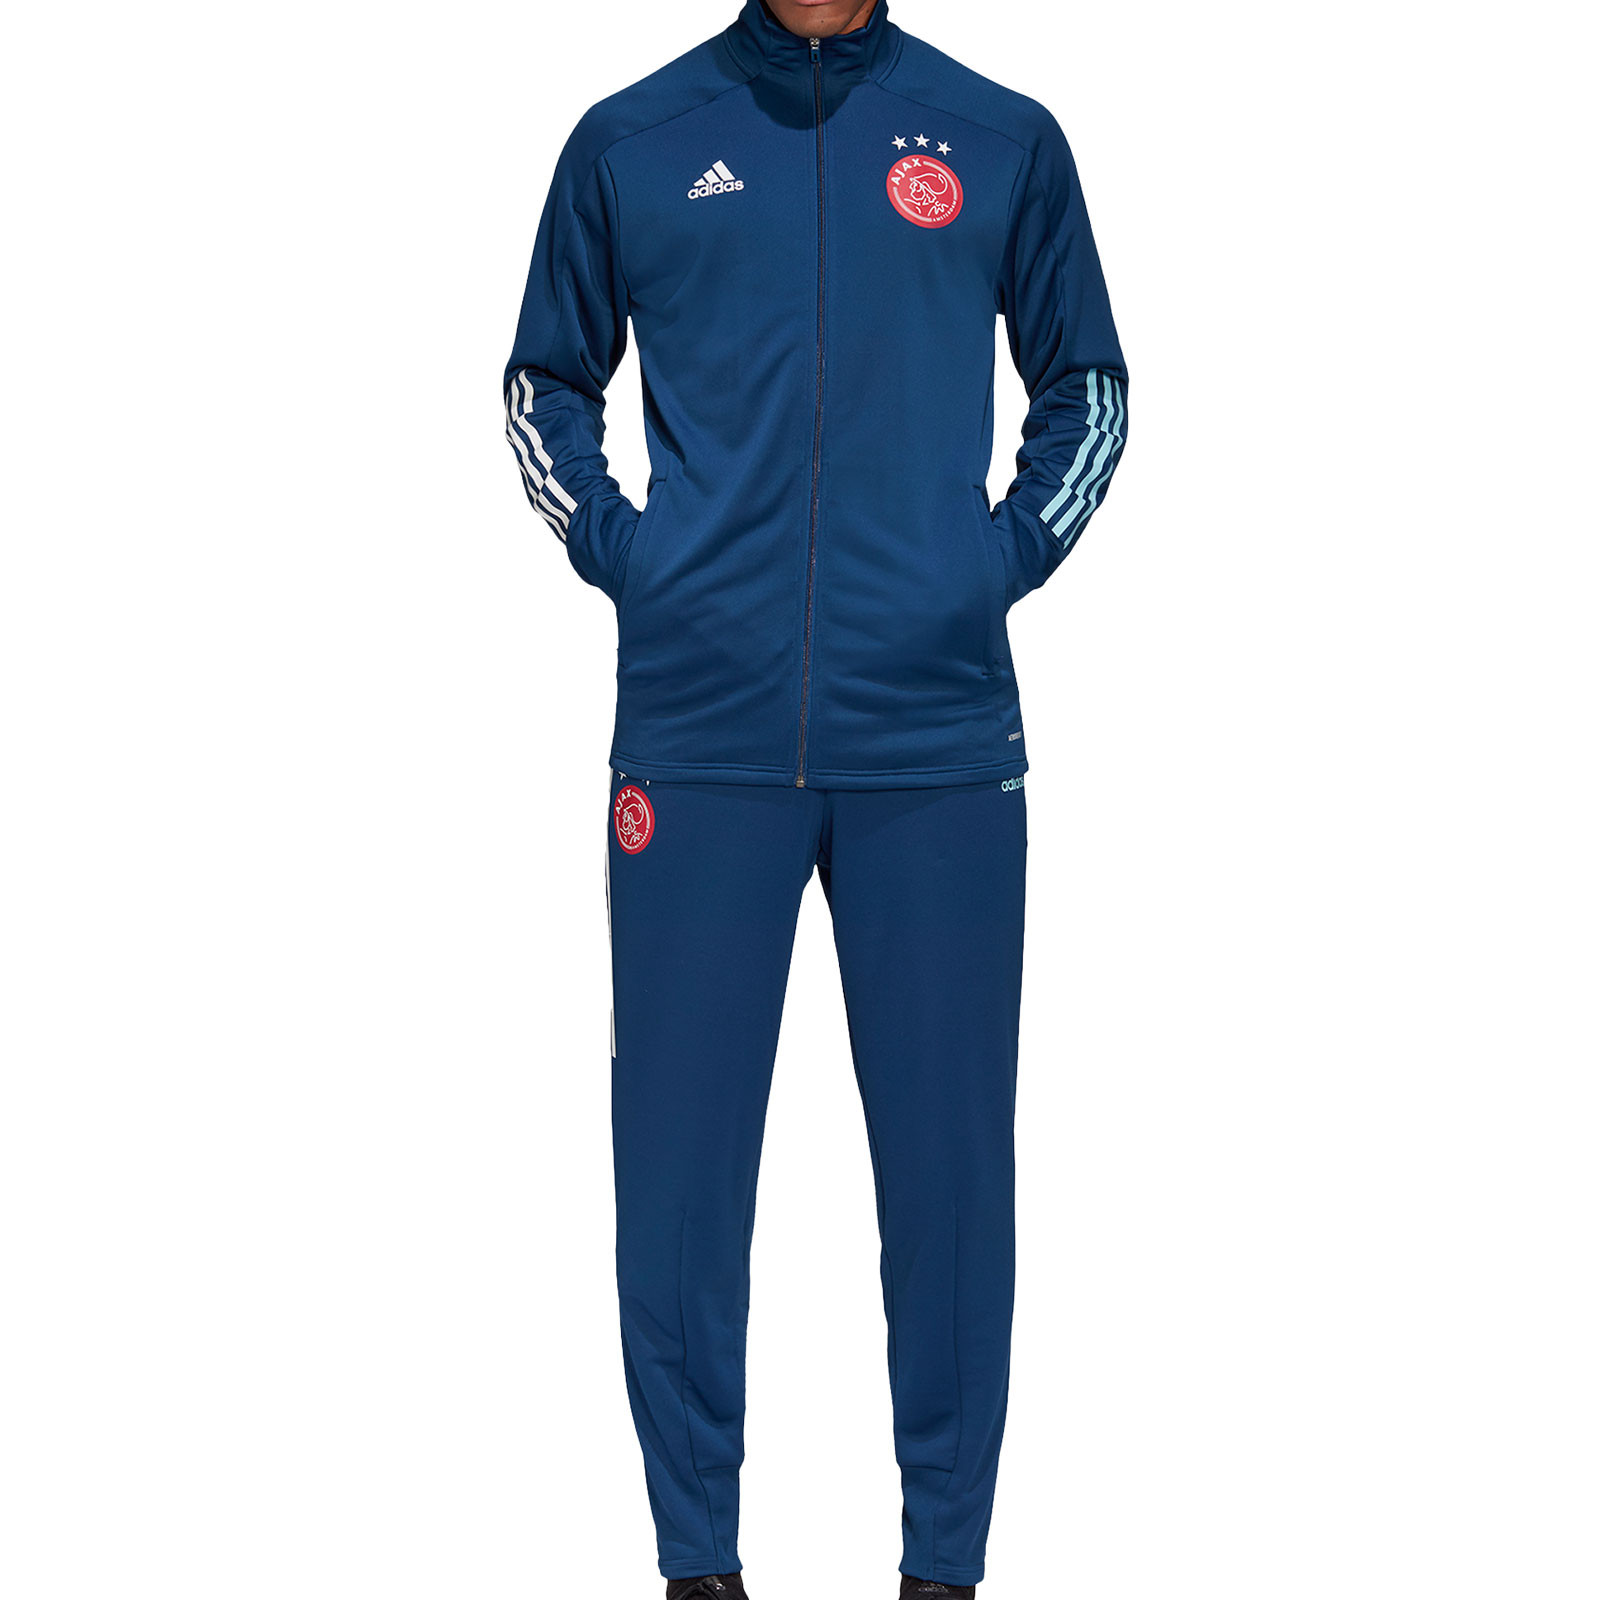 Relativo pierna Feudo  Chándal adidas Ajax 2020 2021 azul marino | futbolmania